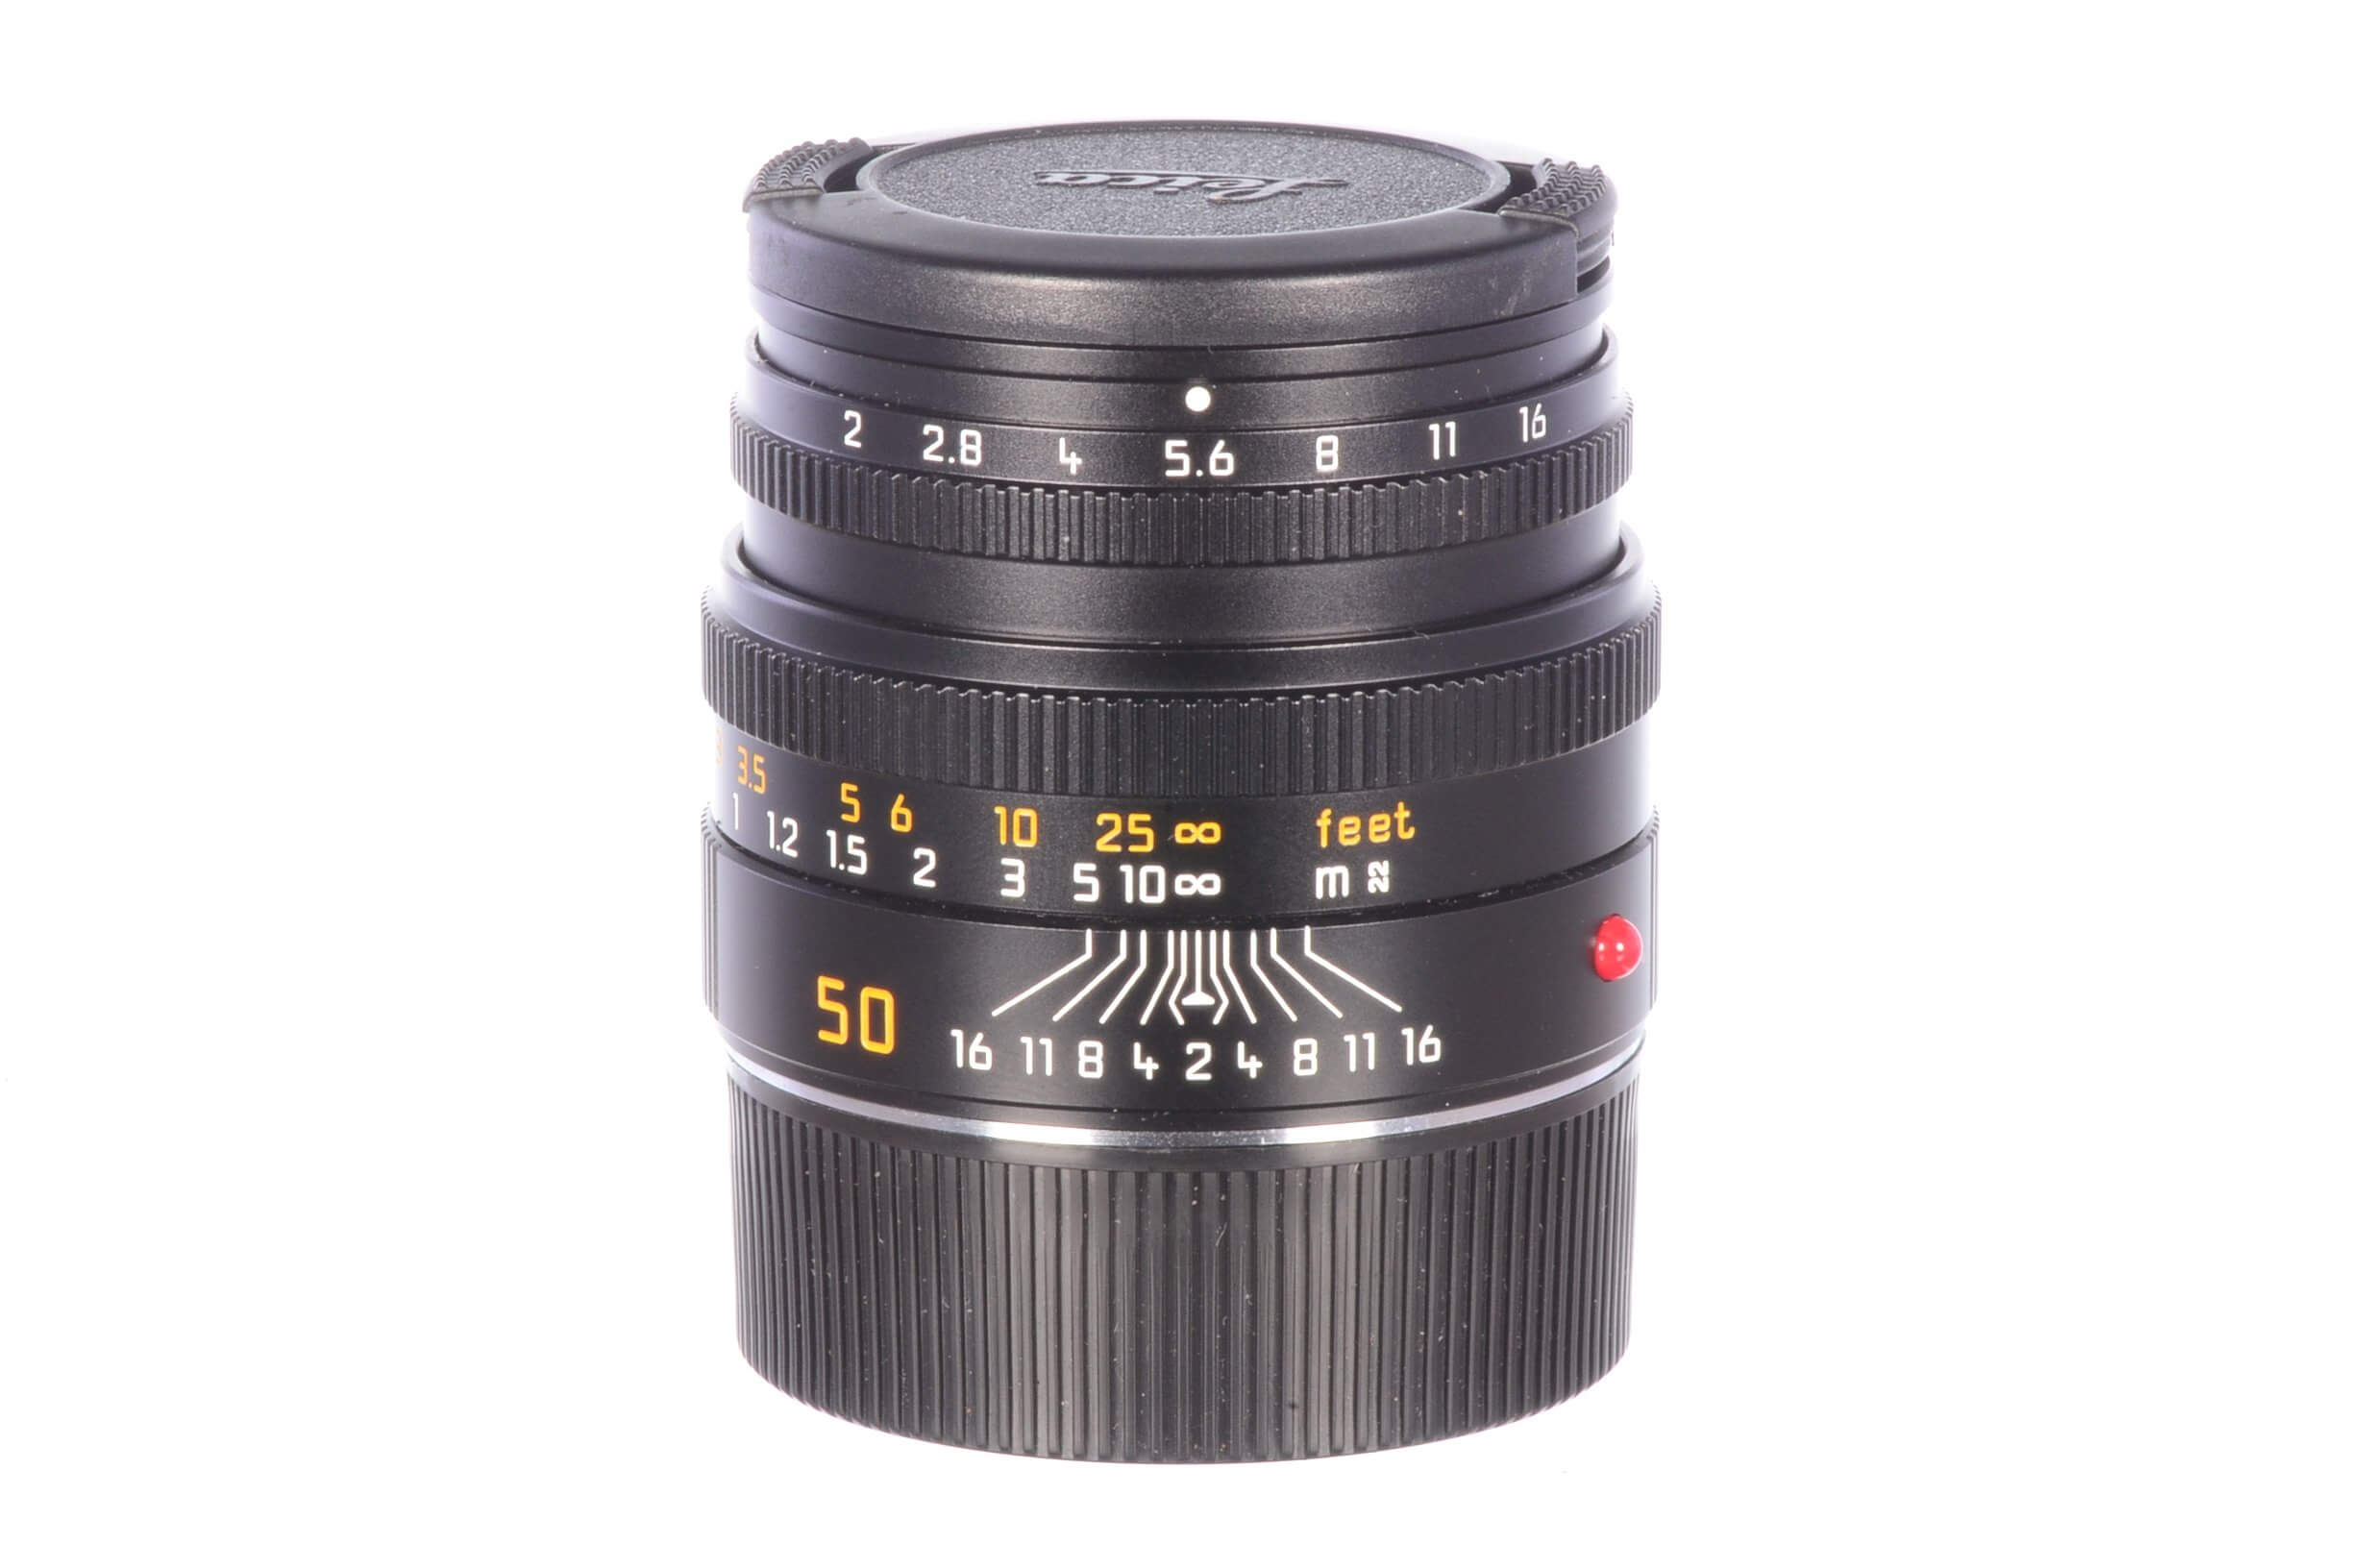 Leica 50mm f2 Summicron M, 6-bit, built-in hood, MINT